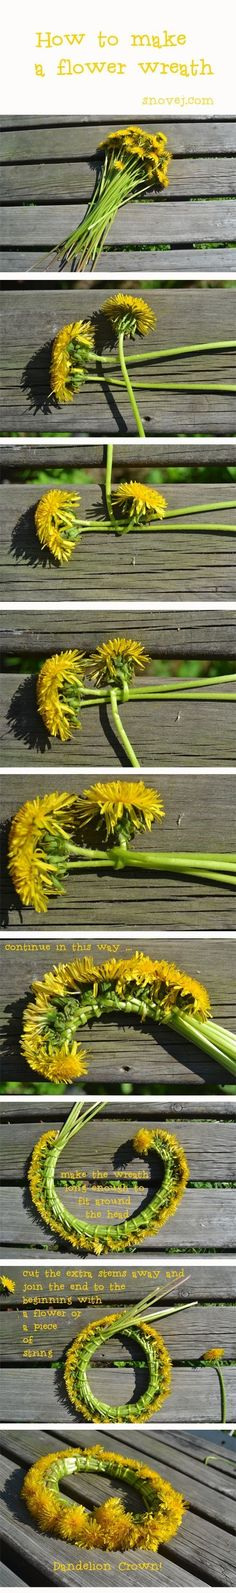 DIY Fresh Flower Heart Wreath is part of Diy flower crown - Diy Crafts Hacks, Cute Crafts, Crafts To Do, Arts And Crafts, Diy Flower Crown, Diy Flowers, Flower Crowns, Flower Crown Drawing, Daisy Crown